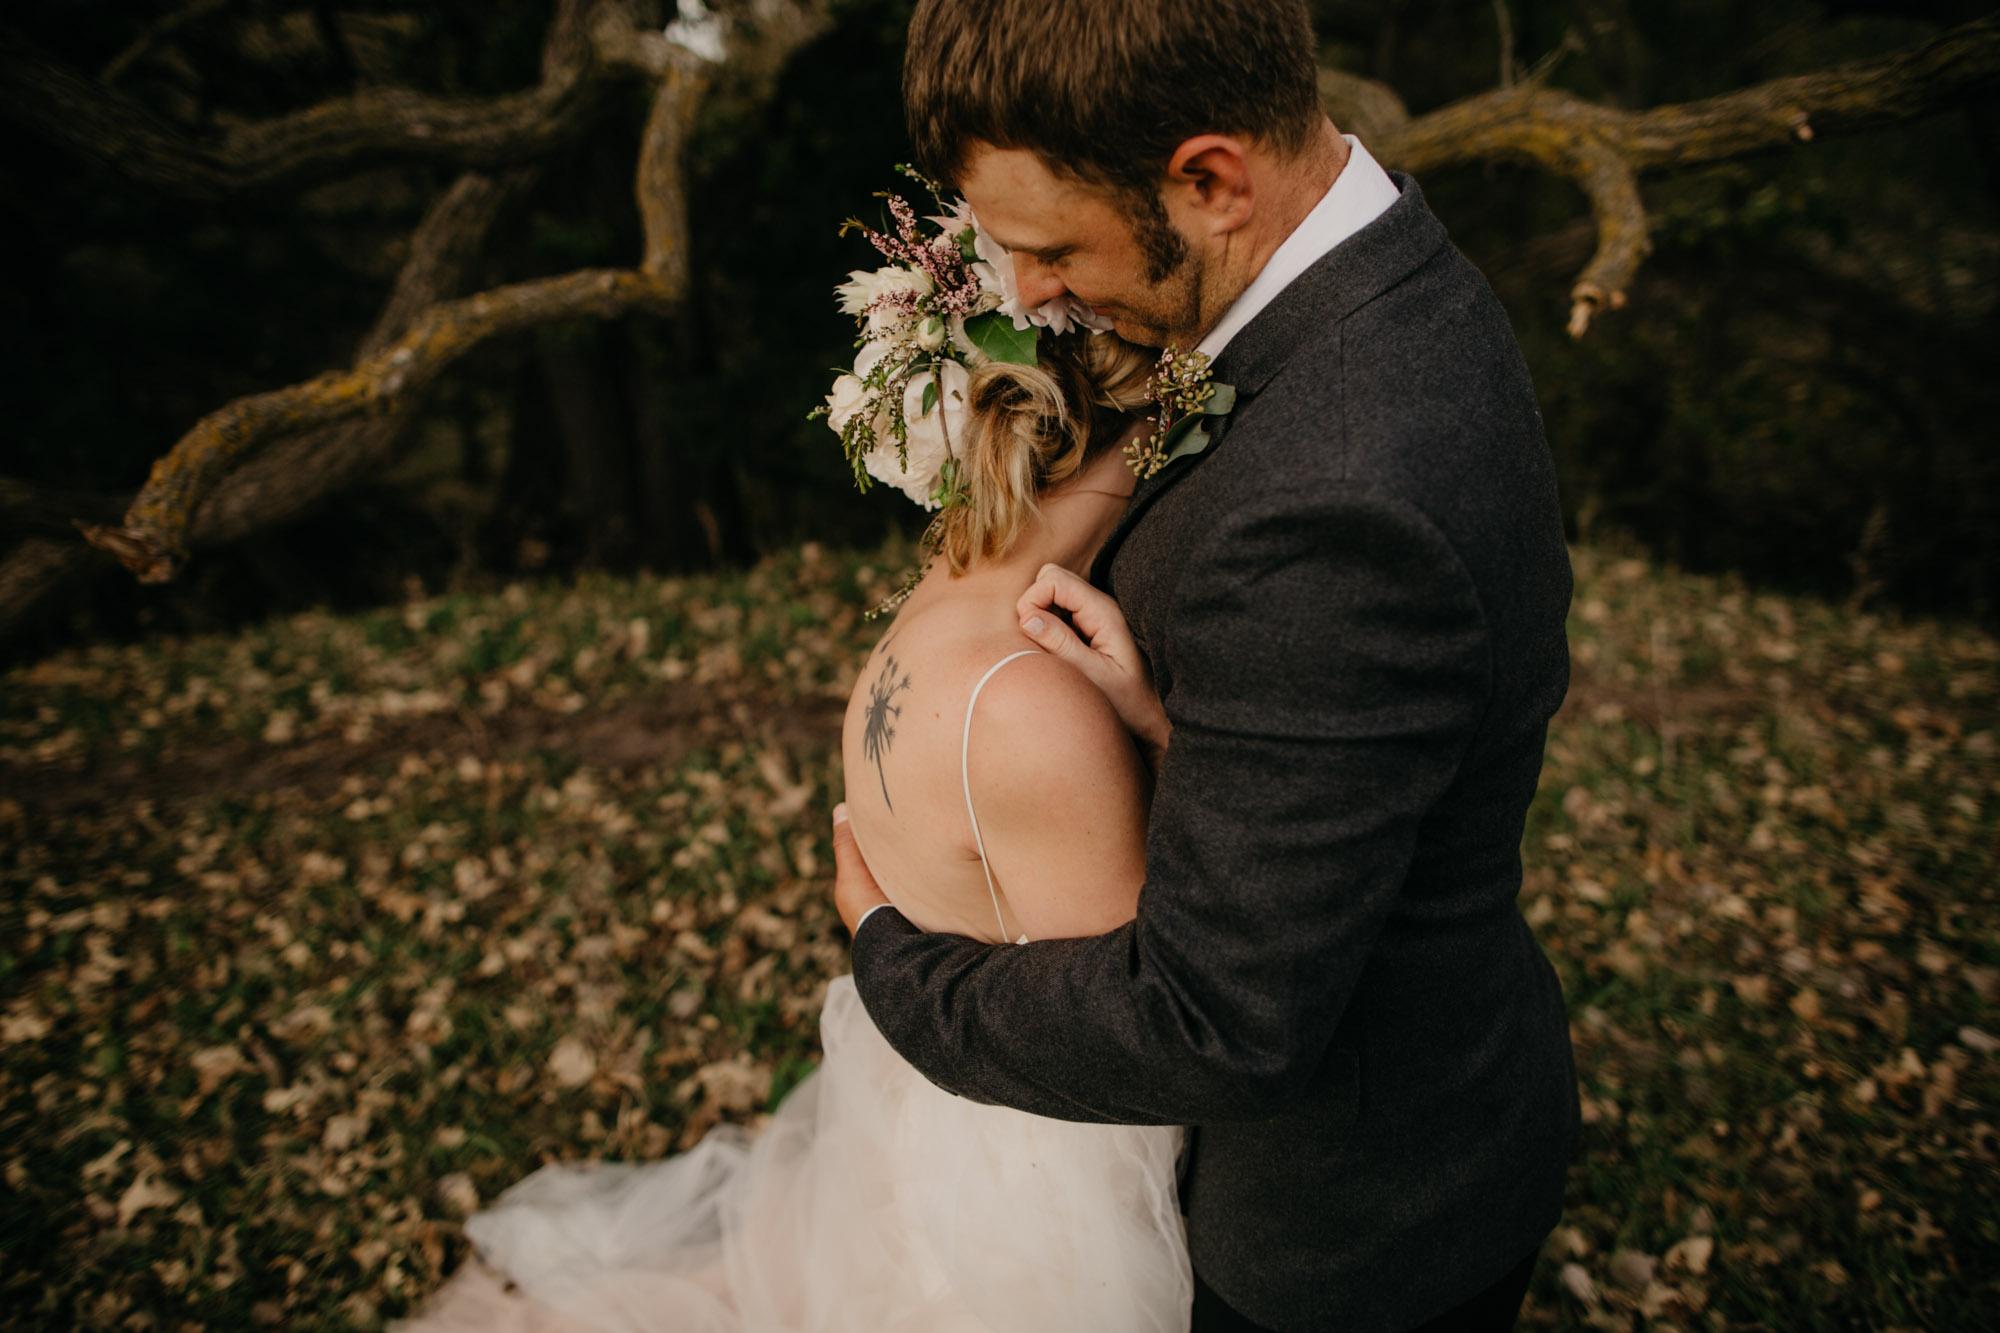 omaha-wedding-photographer-meghan-time-33.jpg